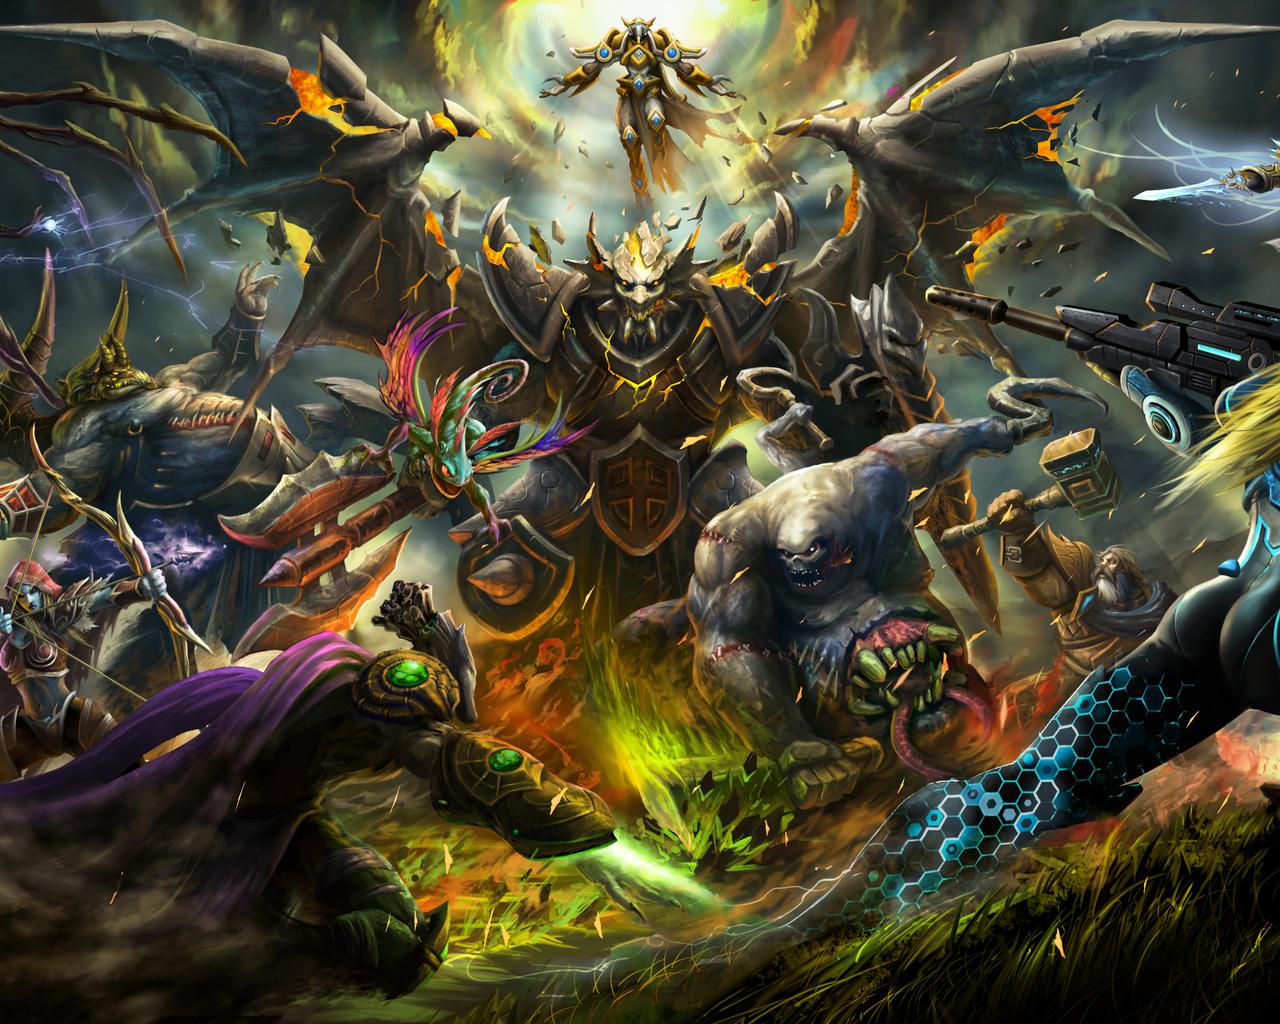 stitches, warcraft, azmodan, starcraft, heroes of the storm, zeratul